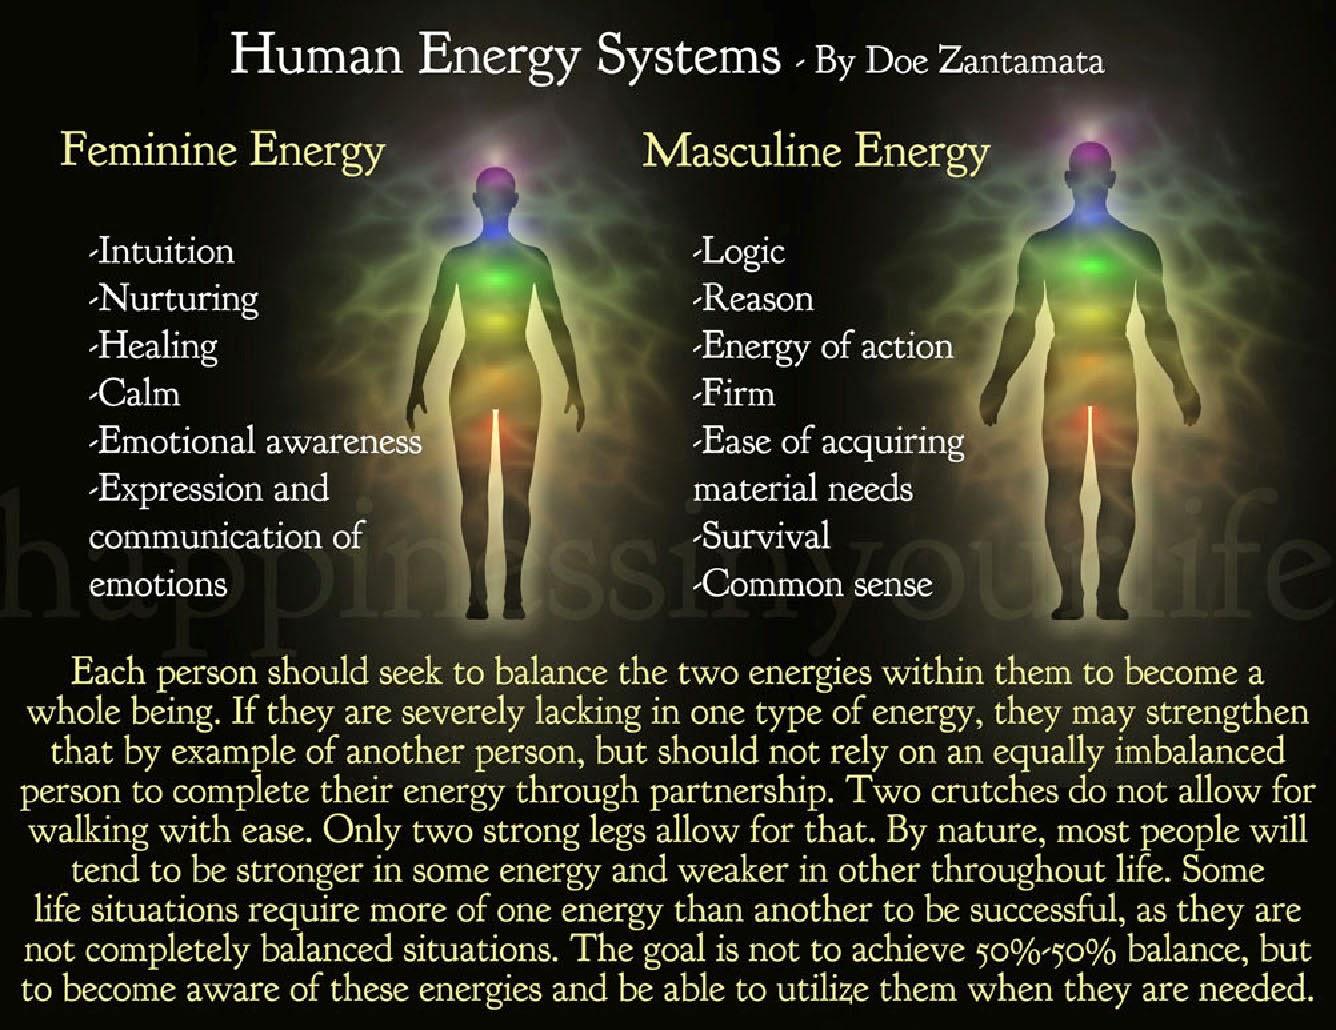 Masculine and Feminine Energy - Part 1